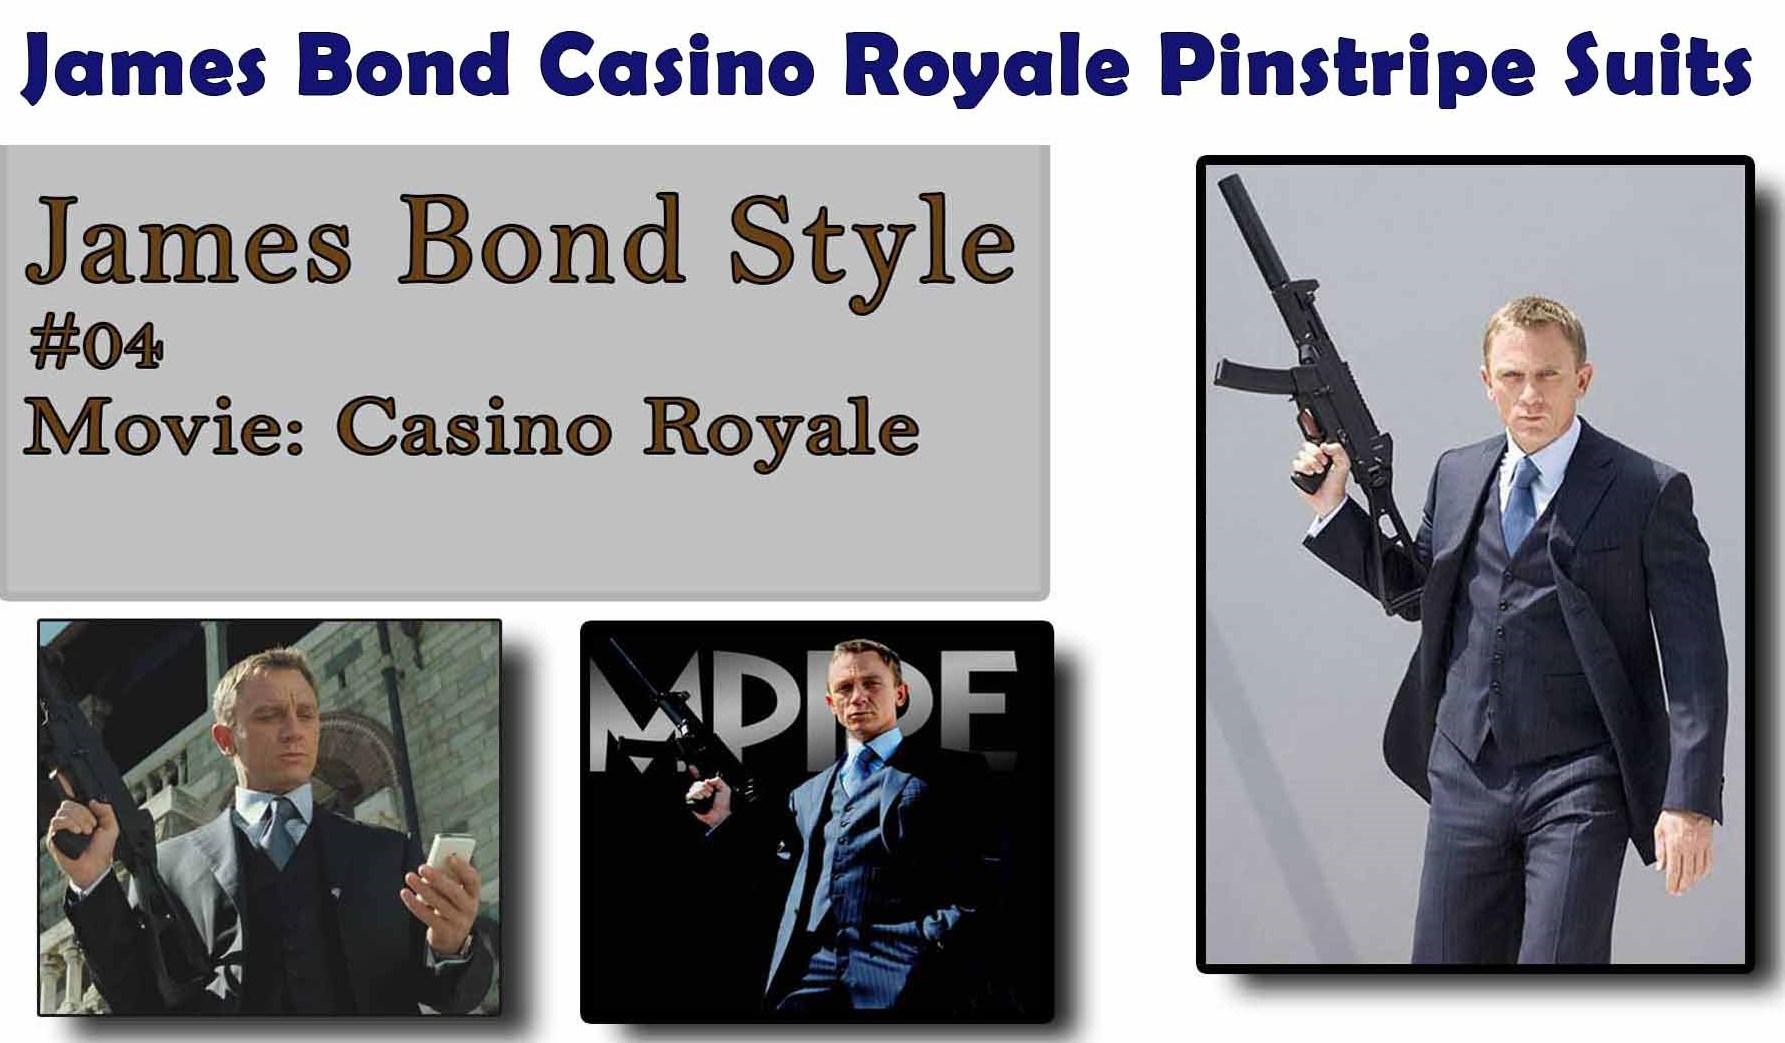 clothes worn james bond casino royale